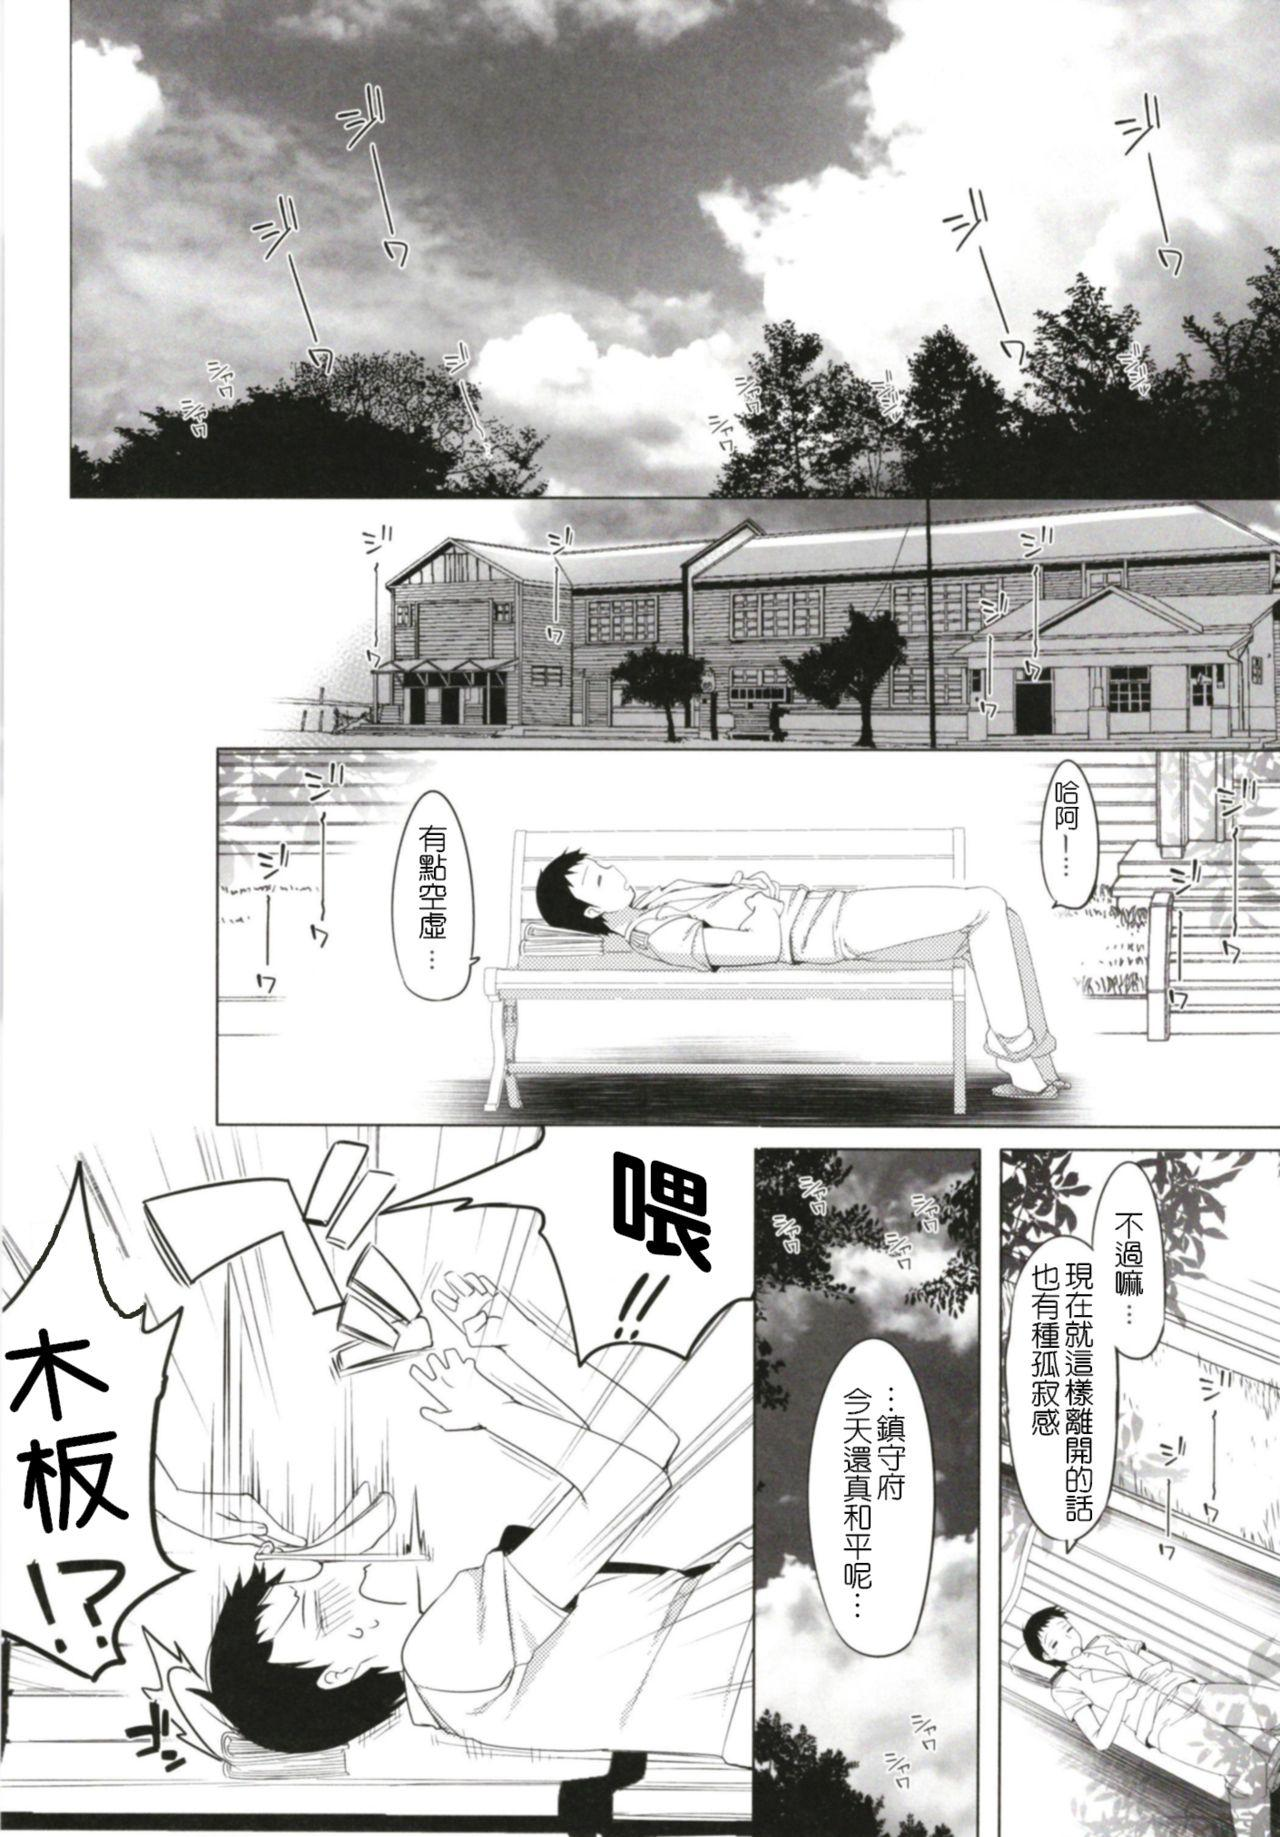 [French letter (Fujisaki Hikari)] Hitonatsu no Ayamachi -I-401 Soushuuhen- (Kantai Collection -KanColle-) [Chinese] [Digital] 34